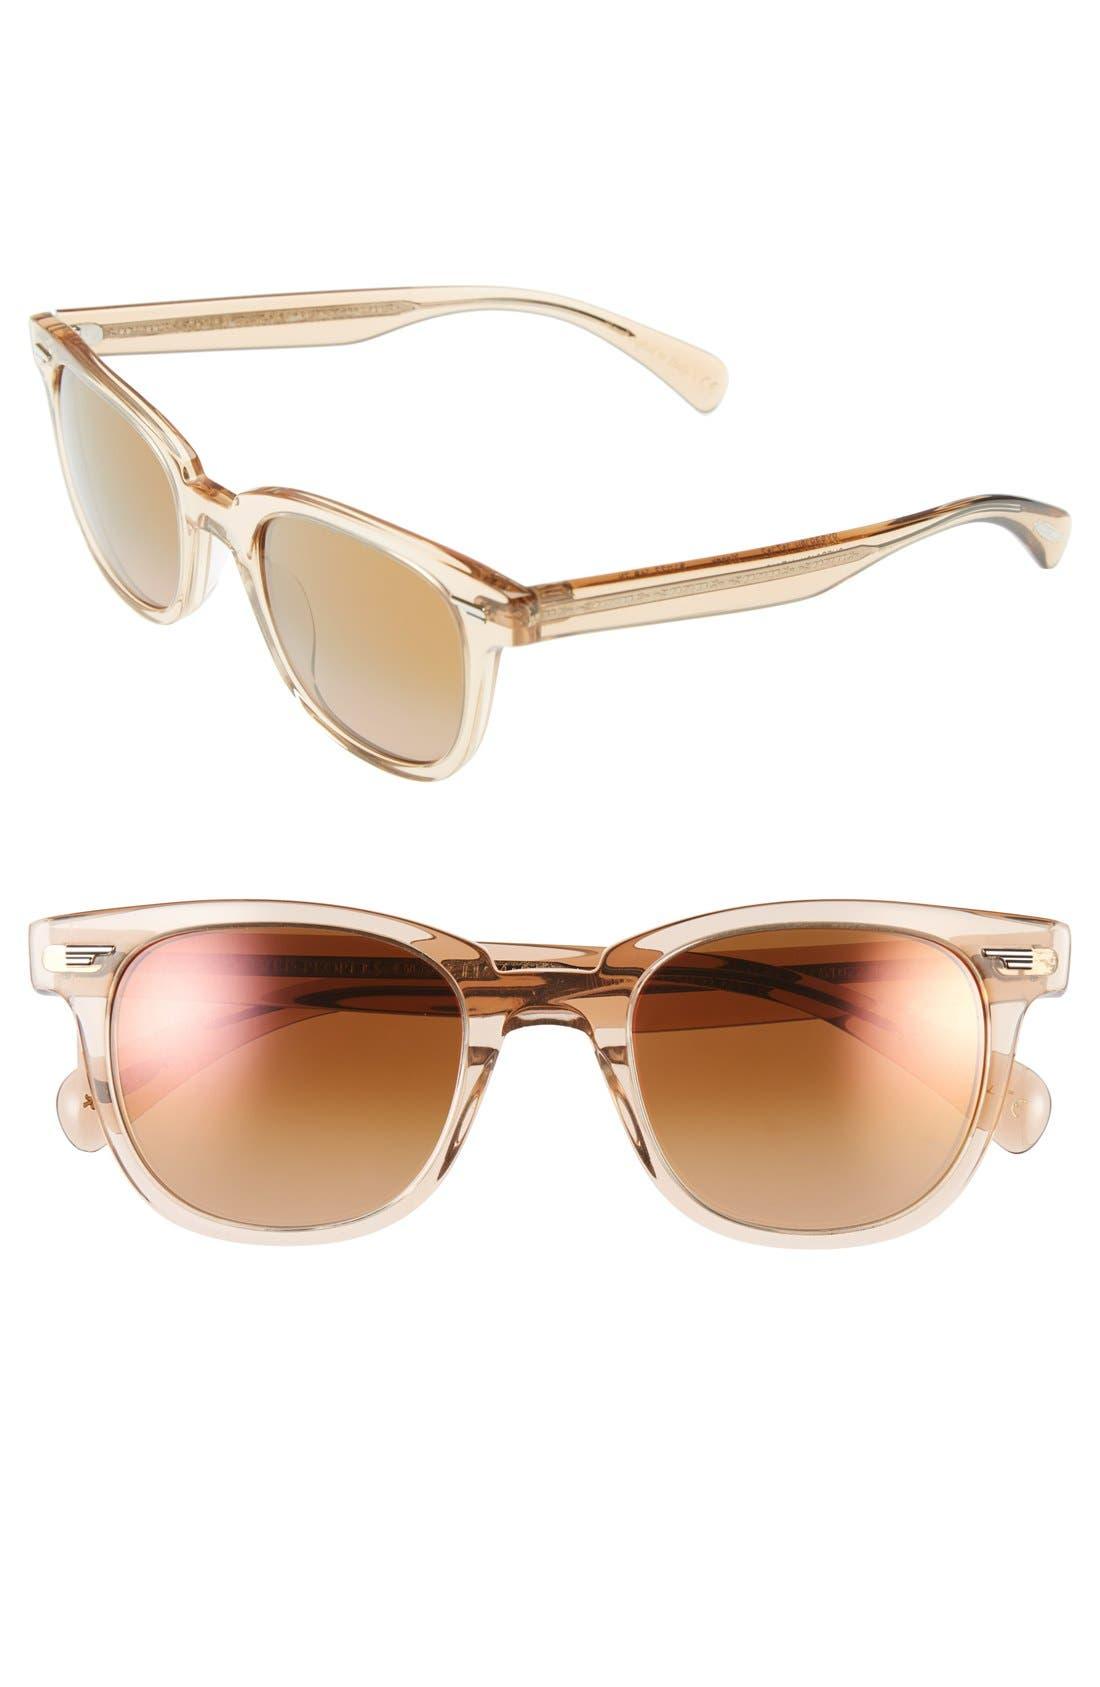 'Masek' 51mm Retro Sunglasses,                         Main,                         color, Pink/ Rose Quartz Mirror